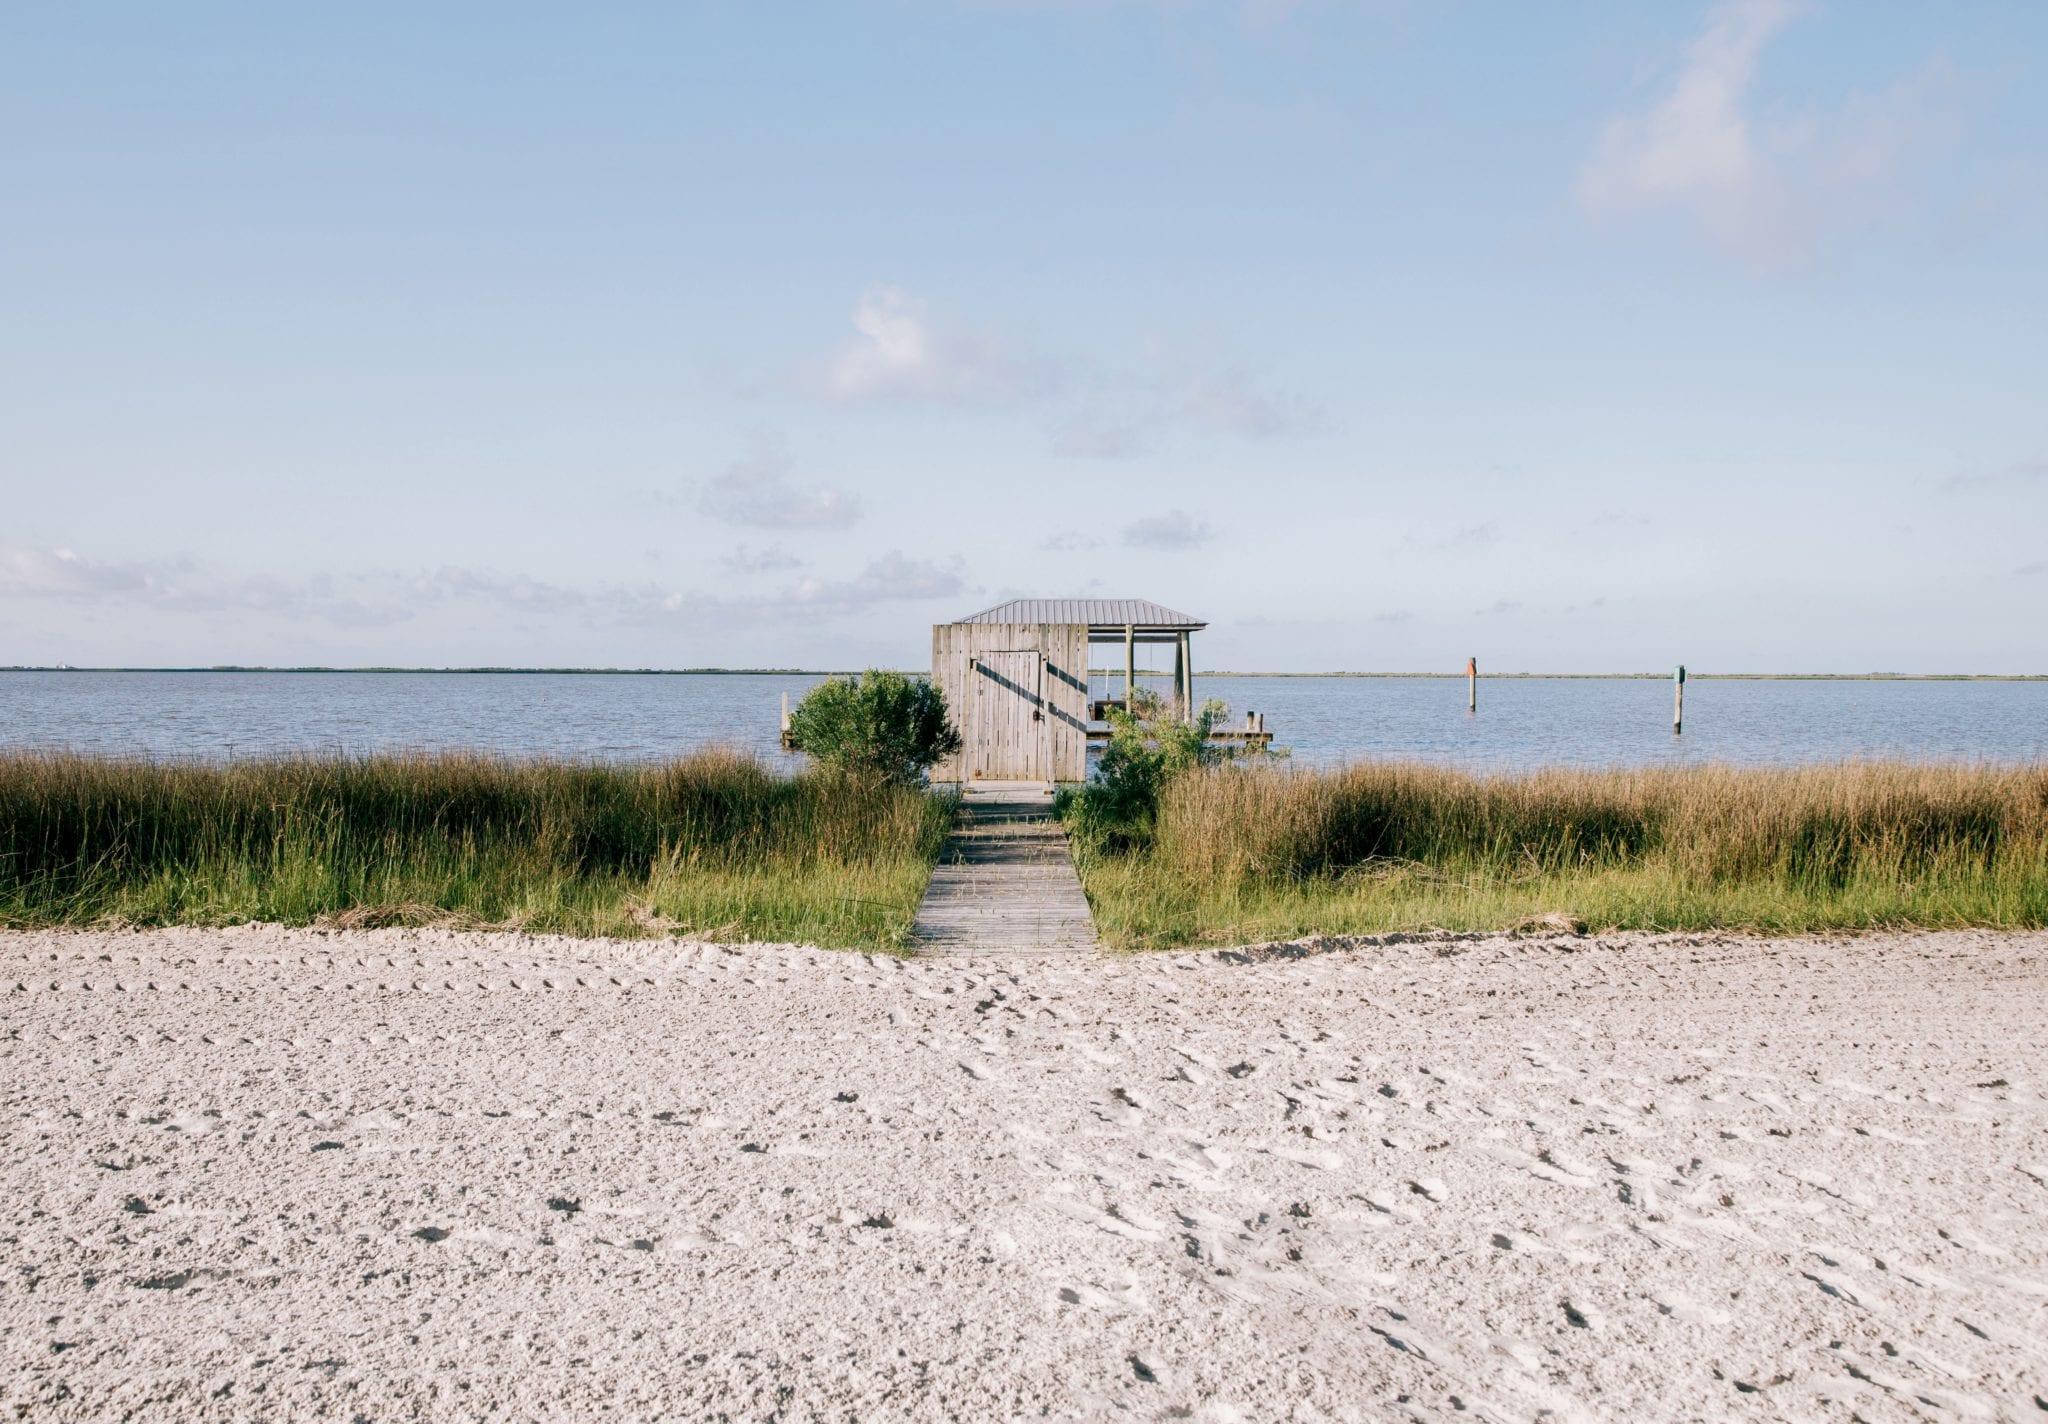 Sand beach old shack Mississippi Sound